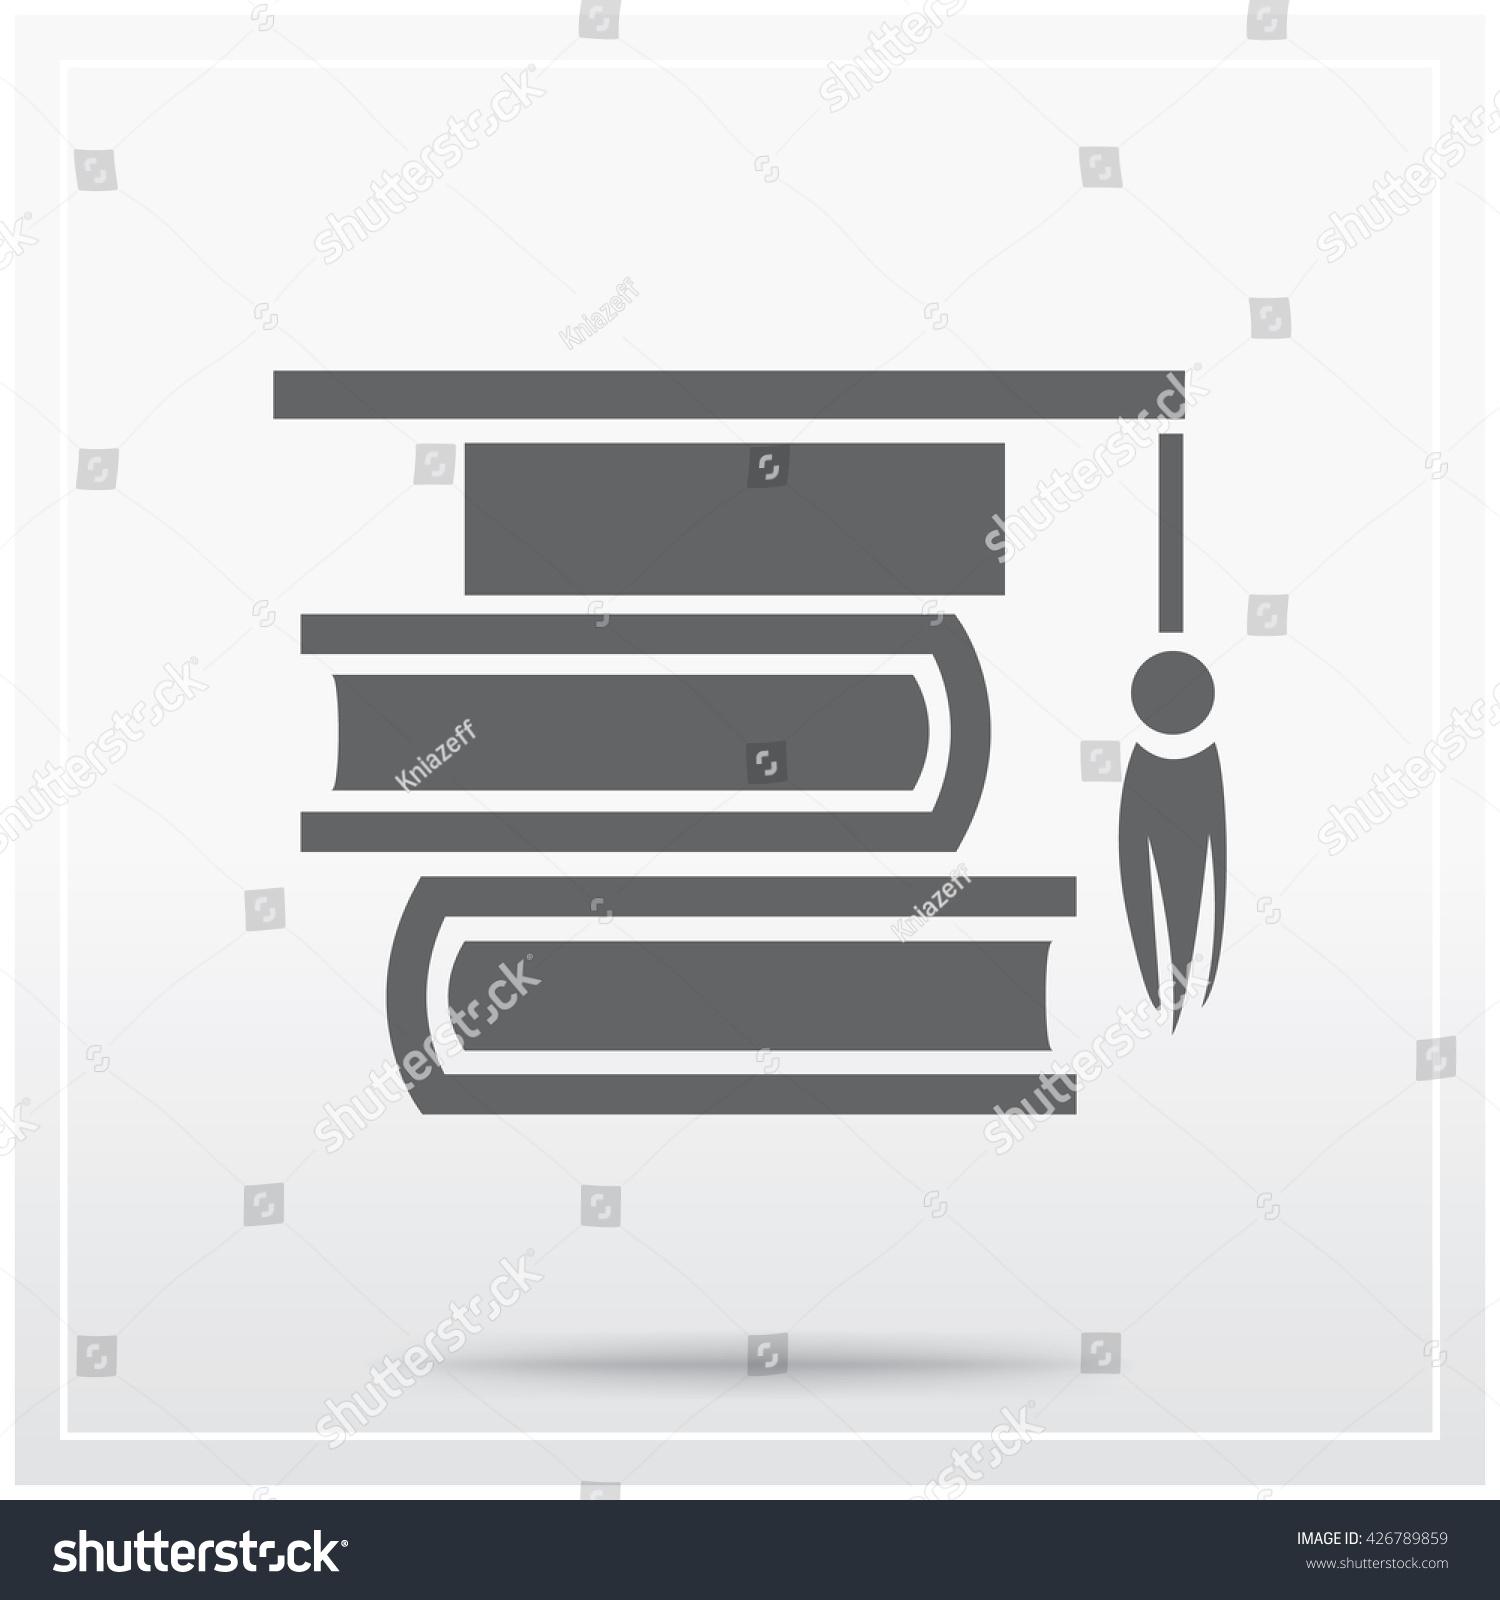 Books Graduation Cap Symbol Education Learning Stock Vector Royalty